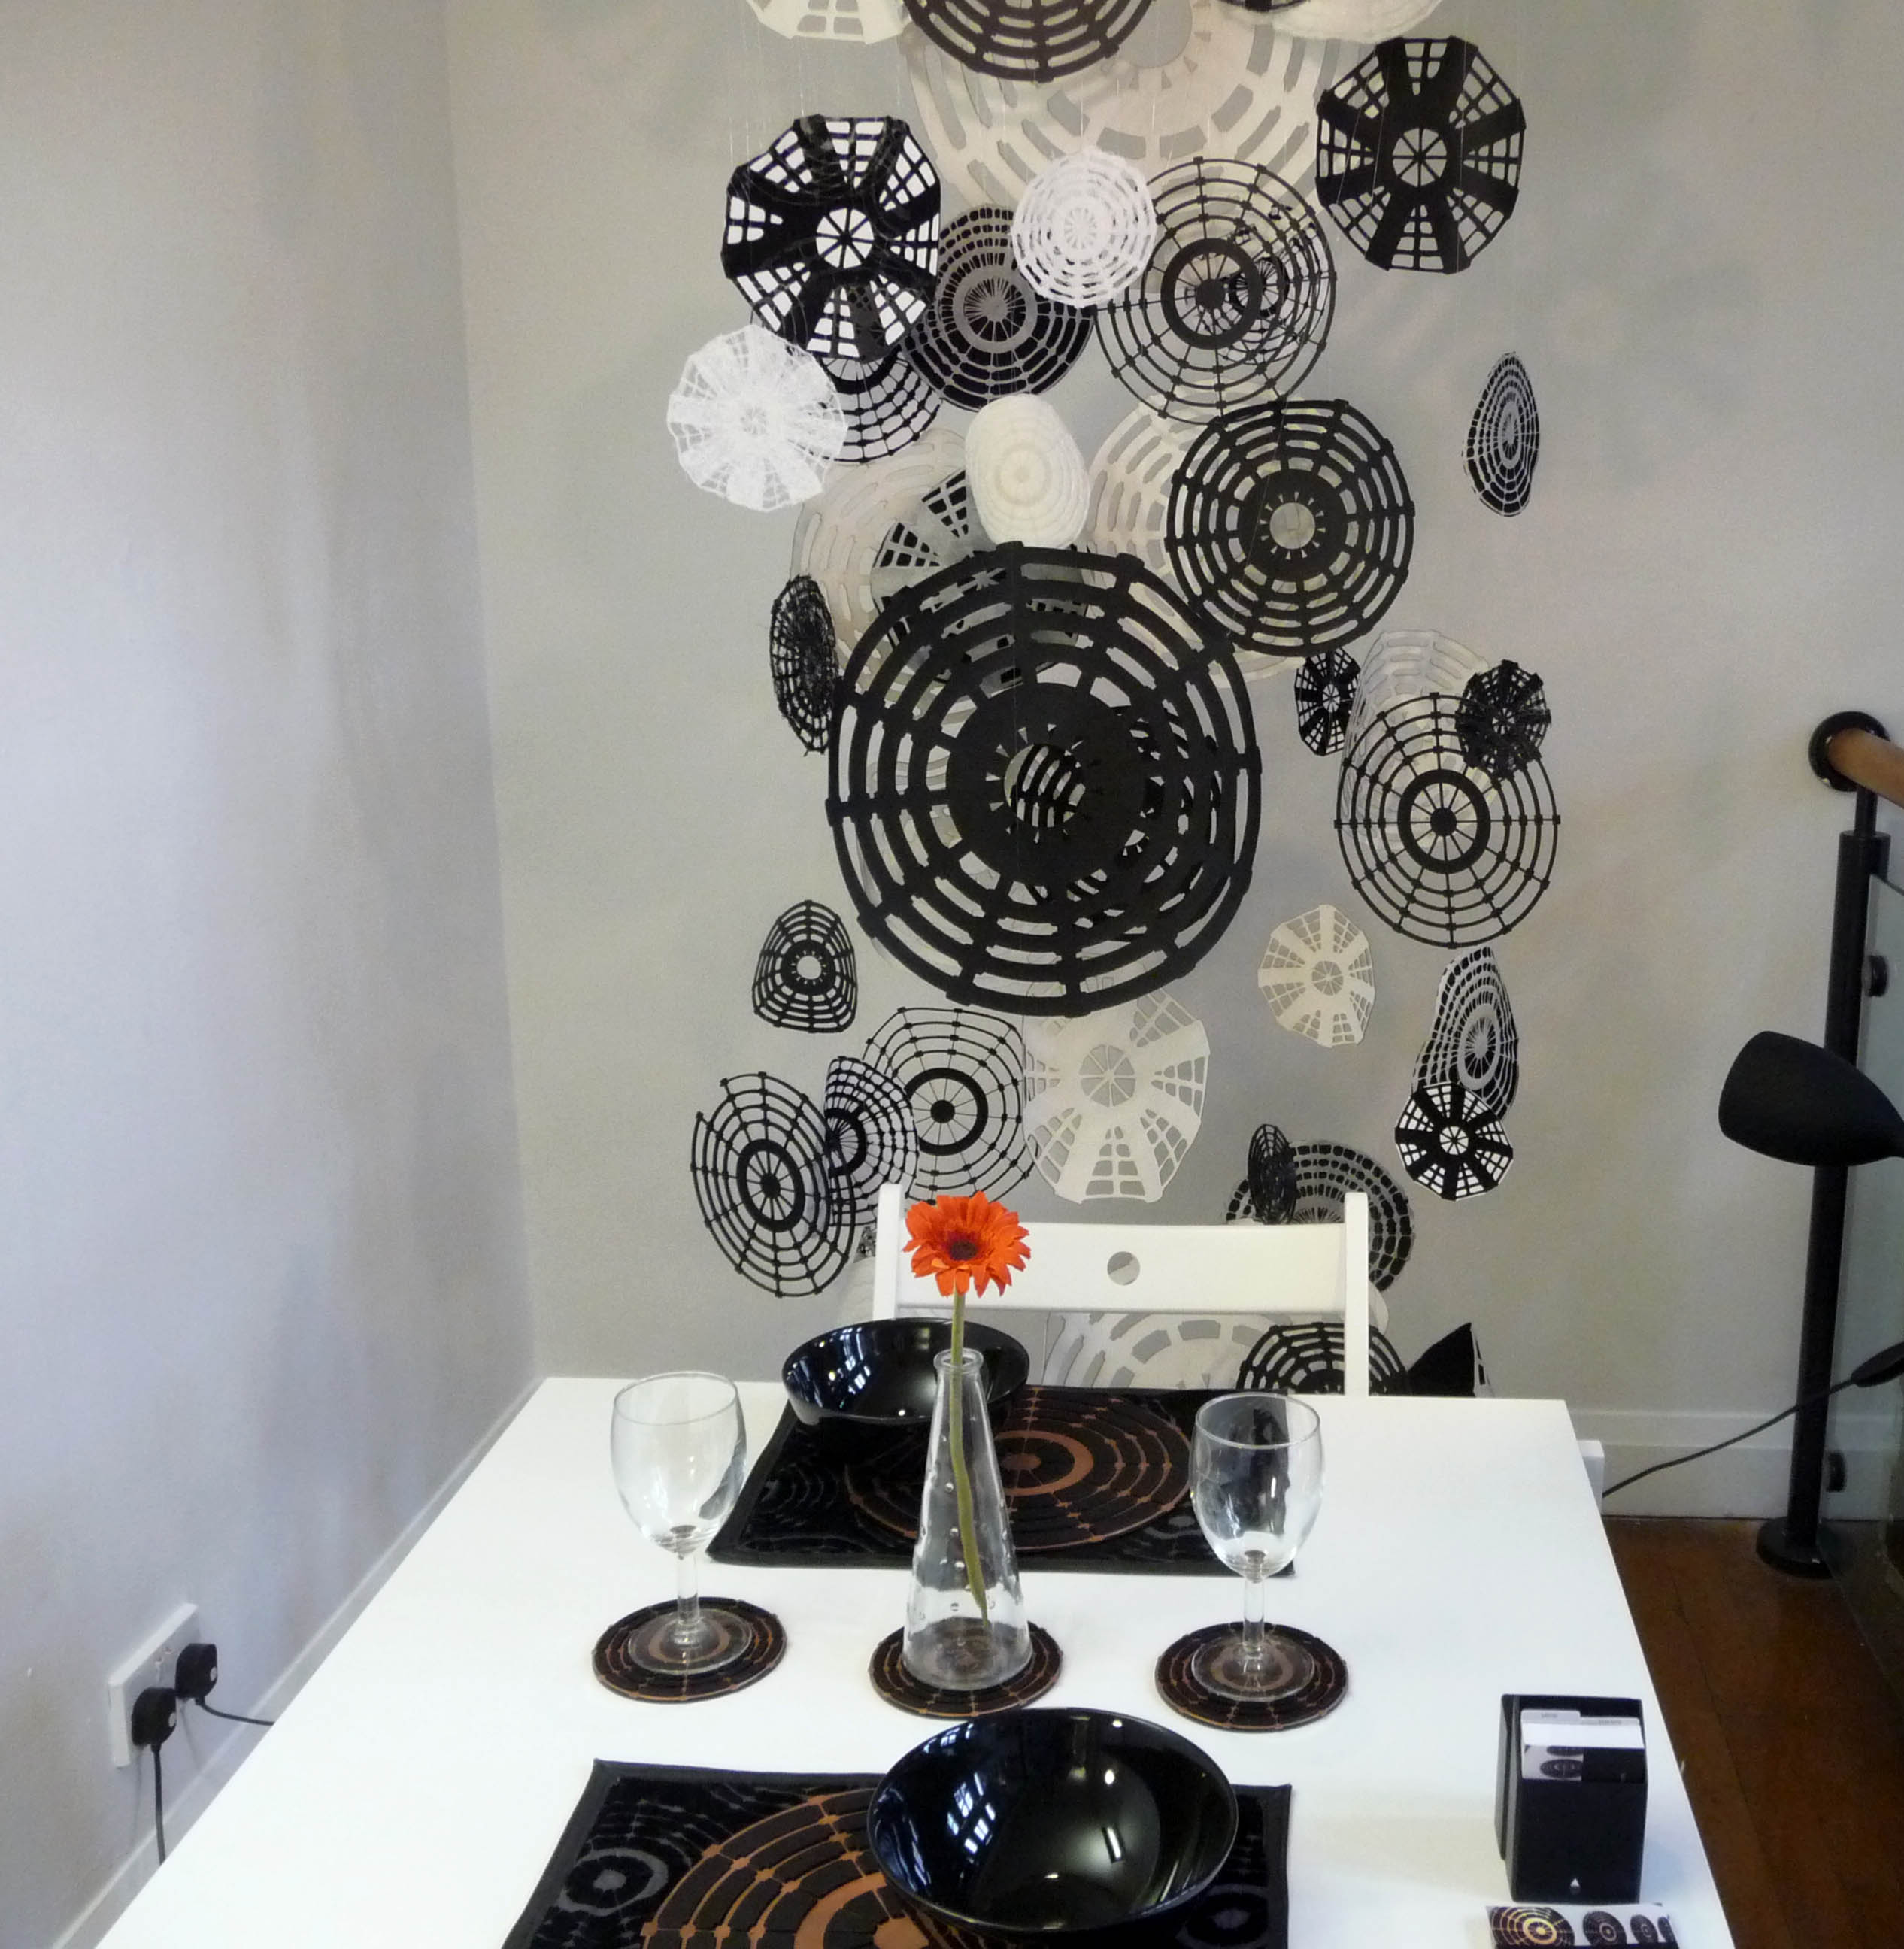 designs by Gemma McGuinness, Liverpool Hope Univ Art Degree Show 2014